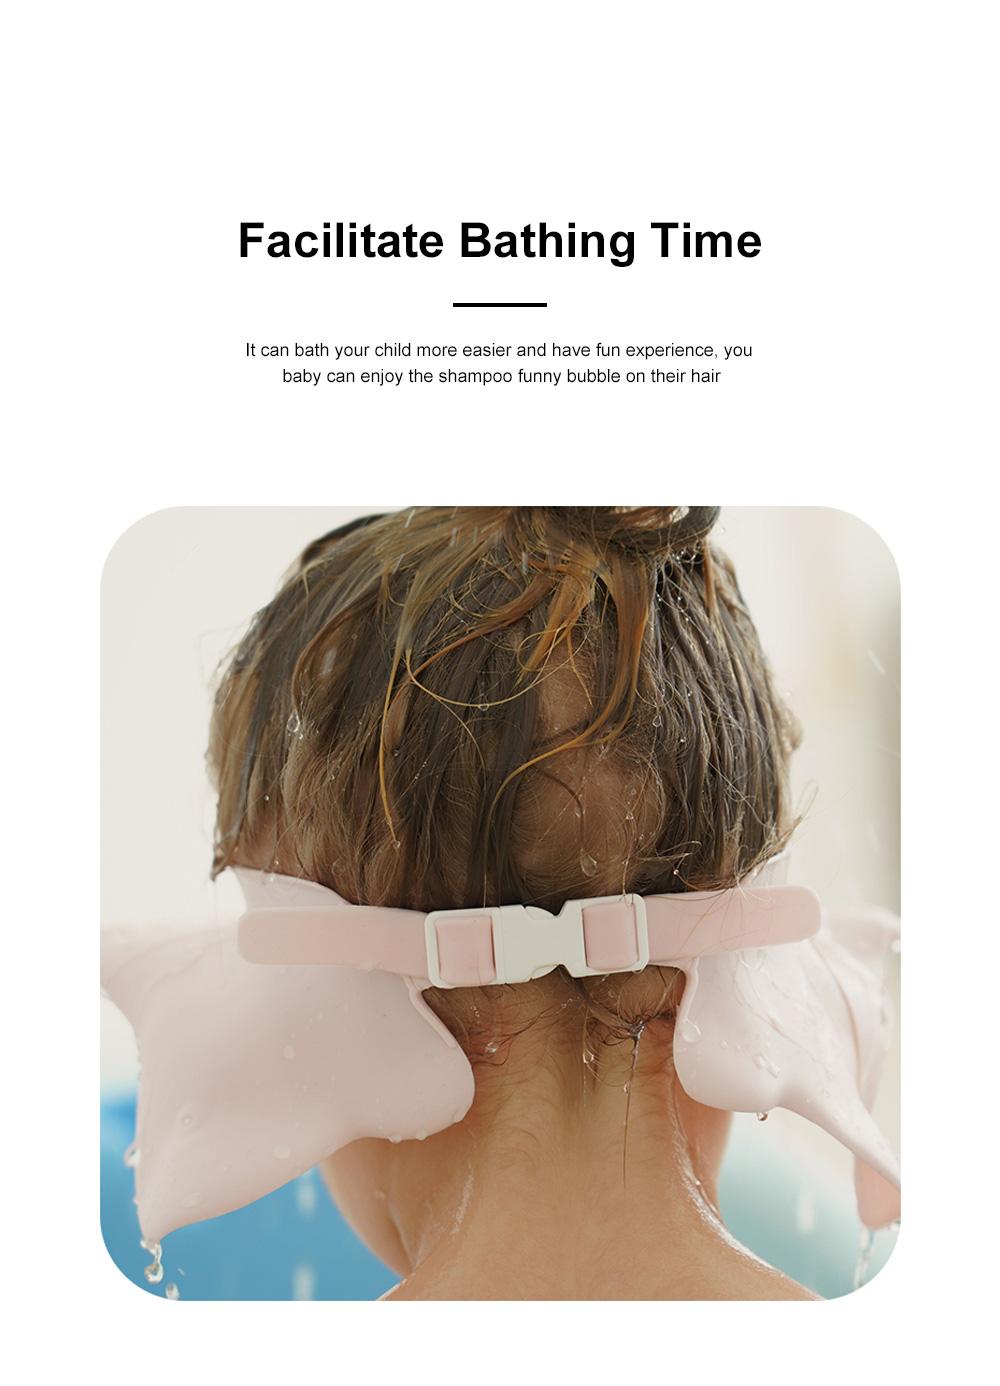 Baby Bathing Cap Shampoo Visor Bathroom Safety Caps with Adjustable Sticker Waterproof & Elastic Octopus Shampoo Hat for Showers, Bathing 5